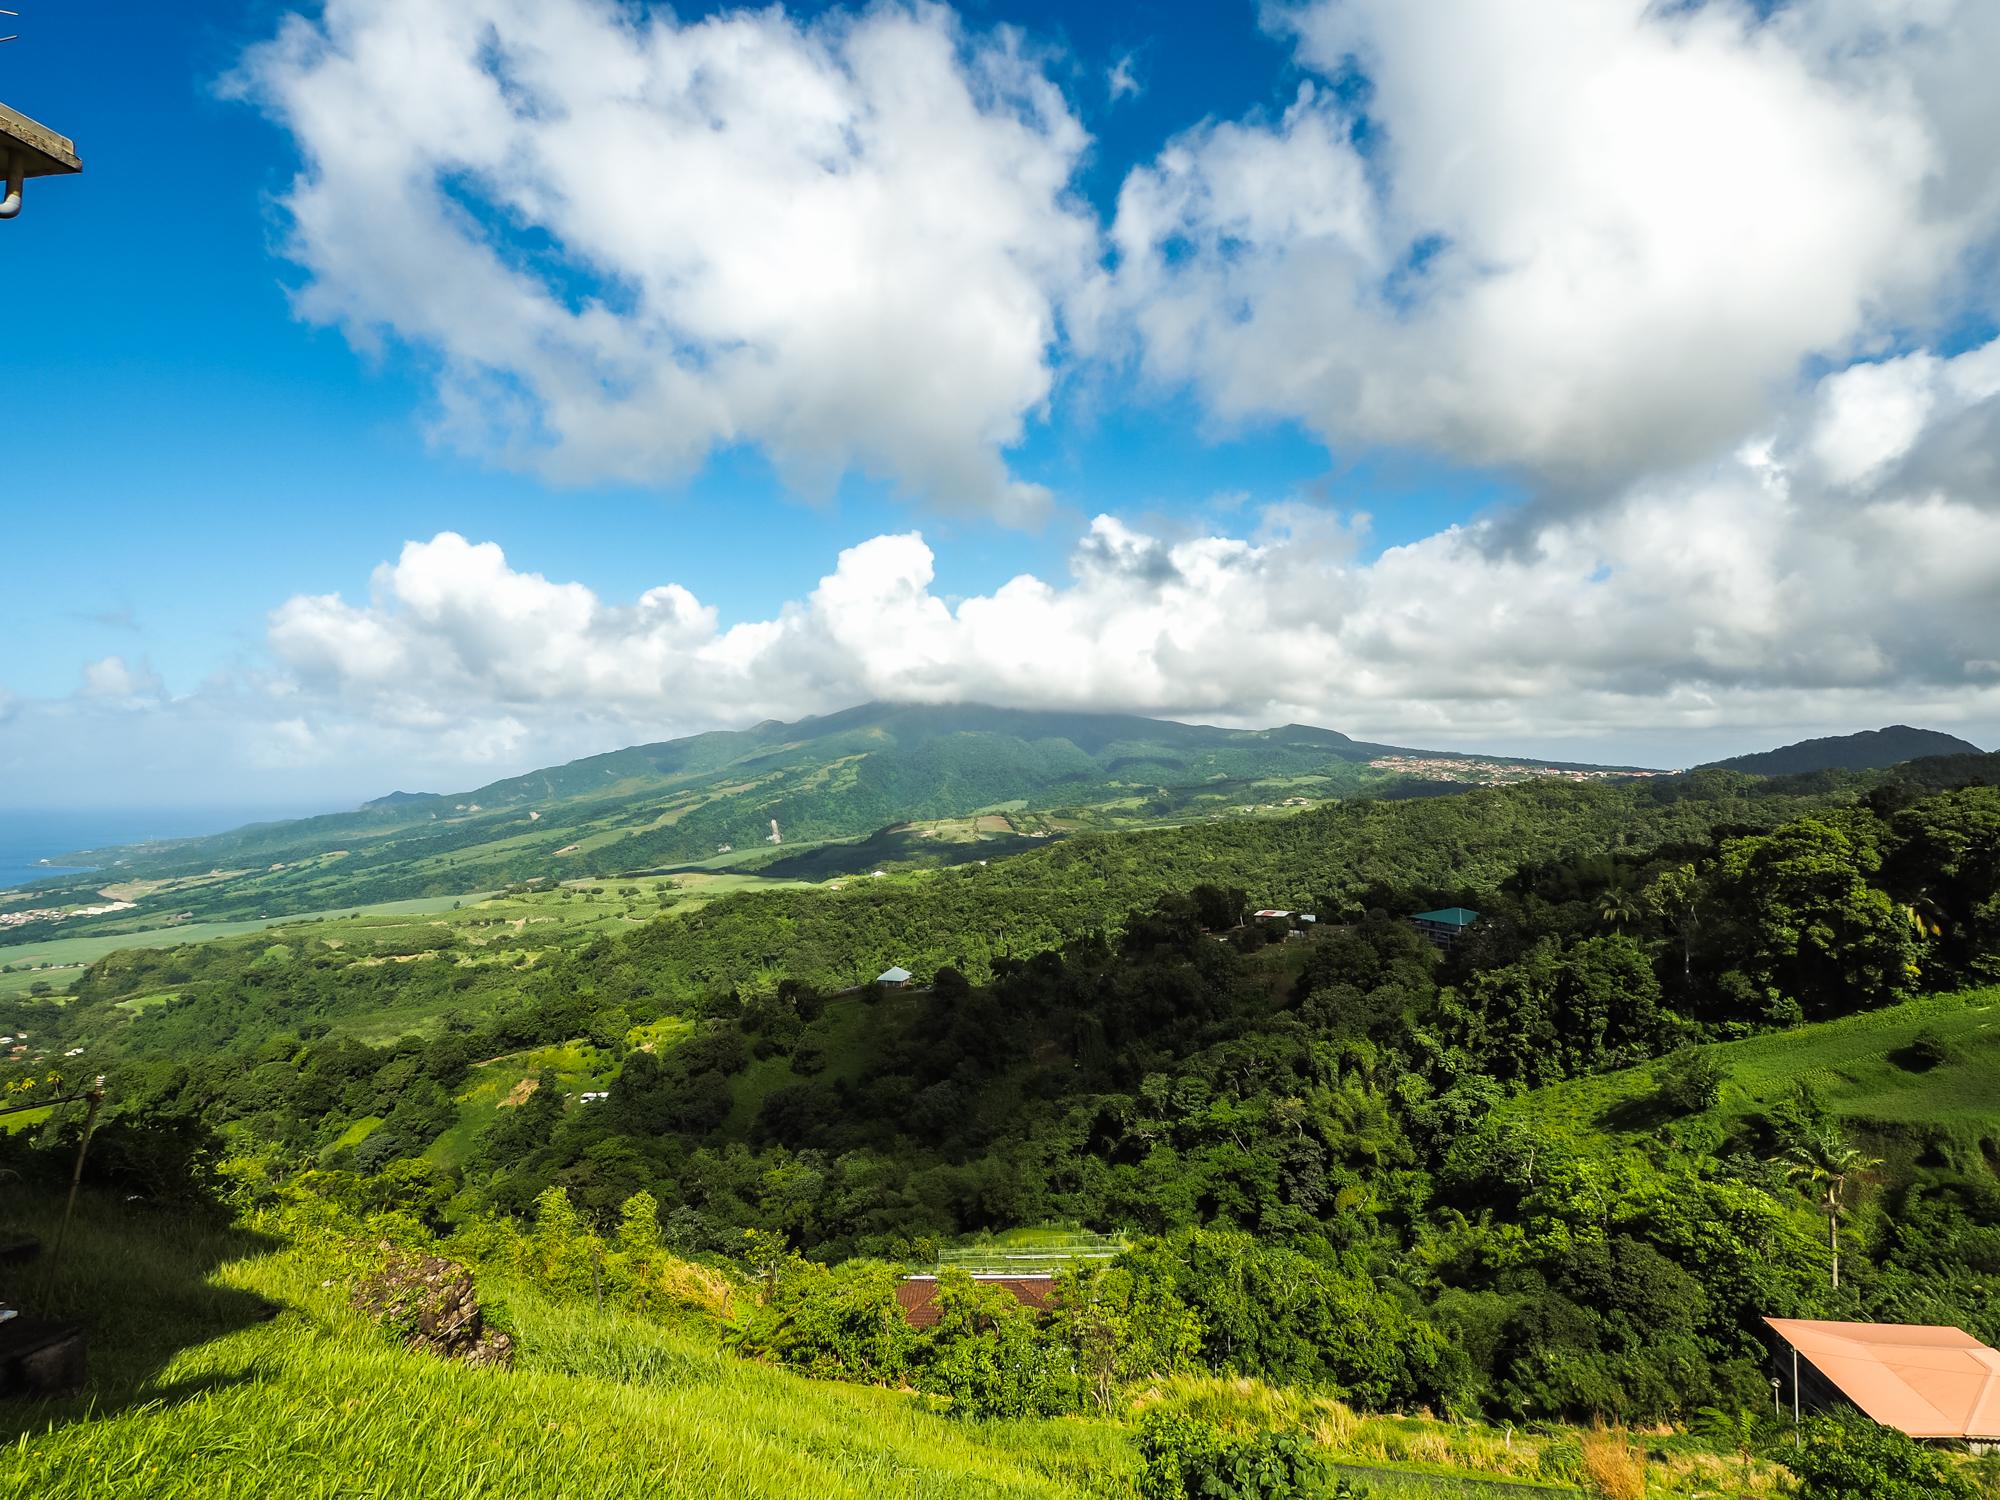 Montagne pelée, Martinique blog voyage martinique sauvage